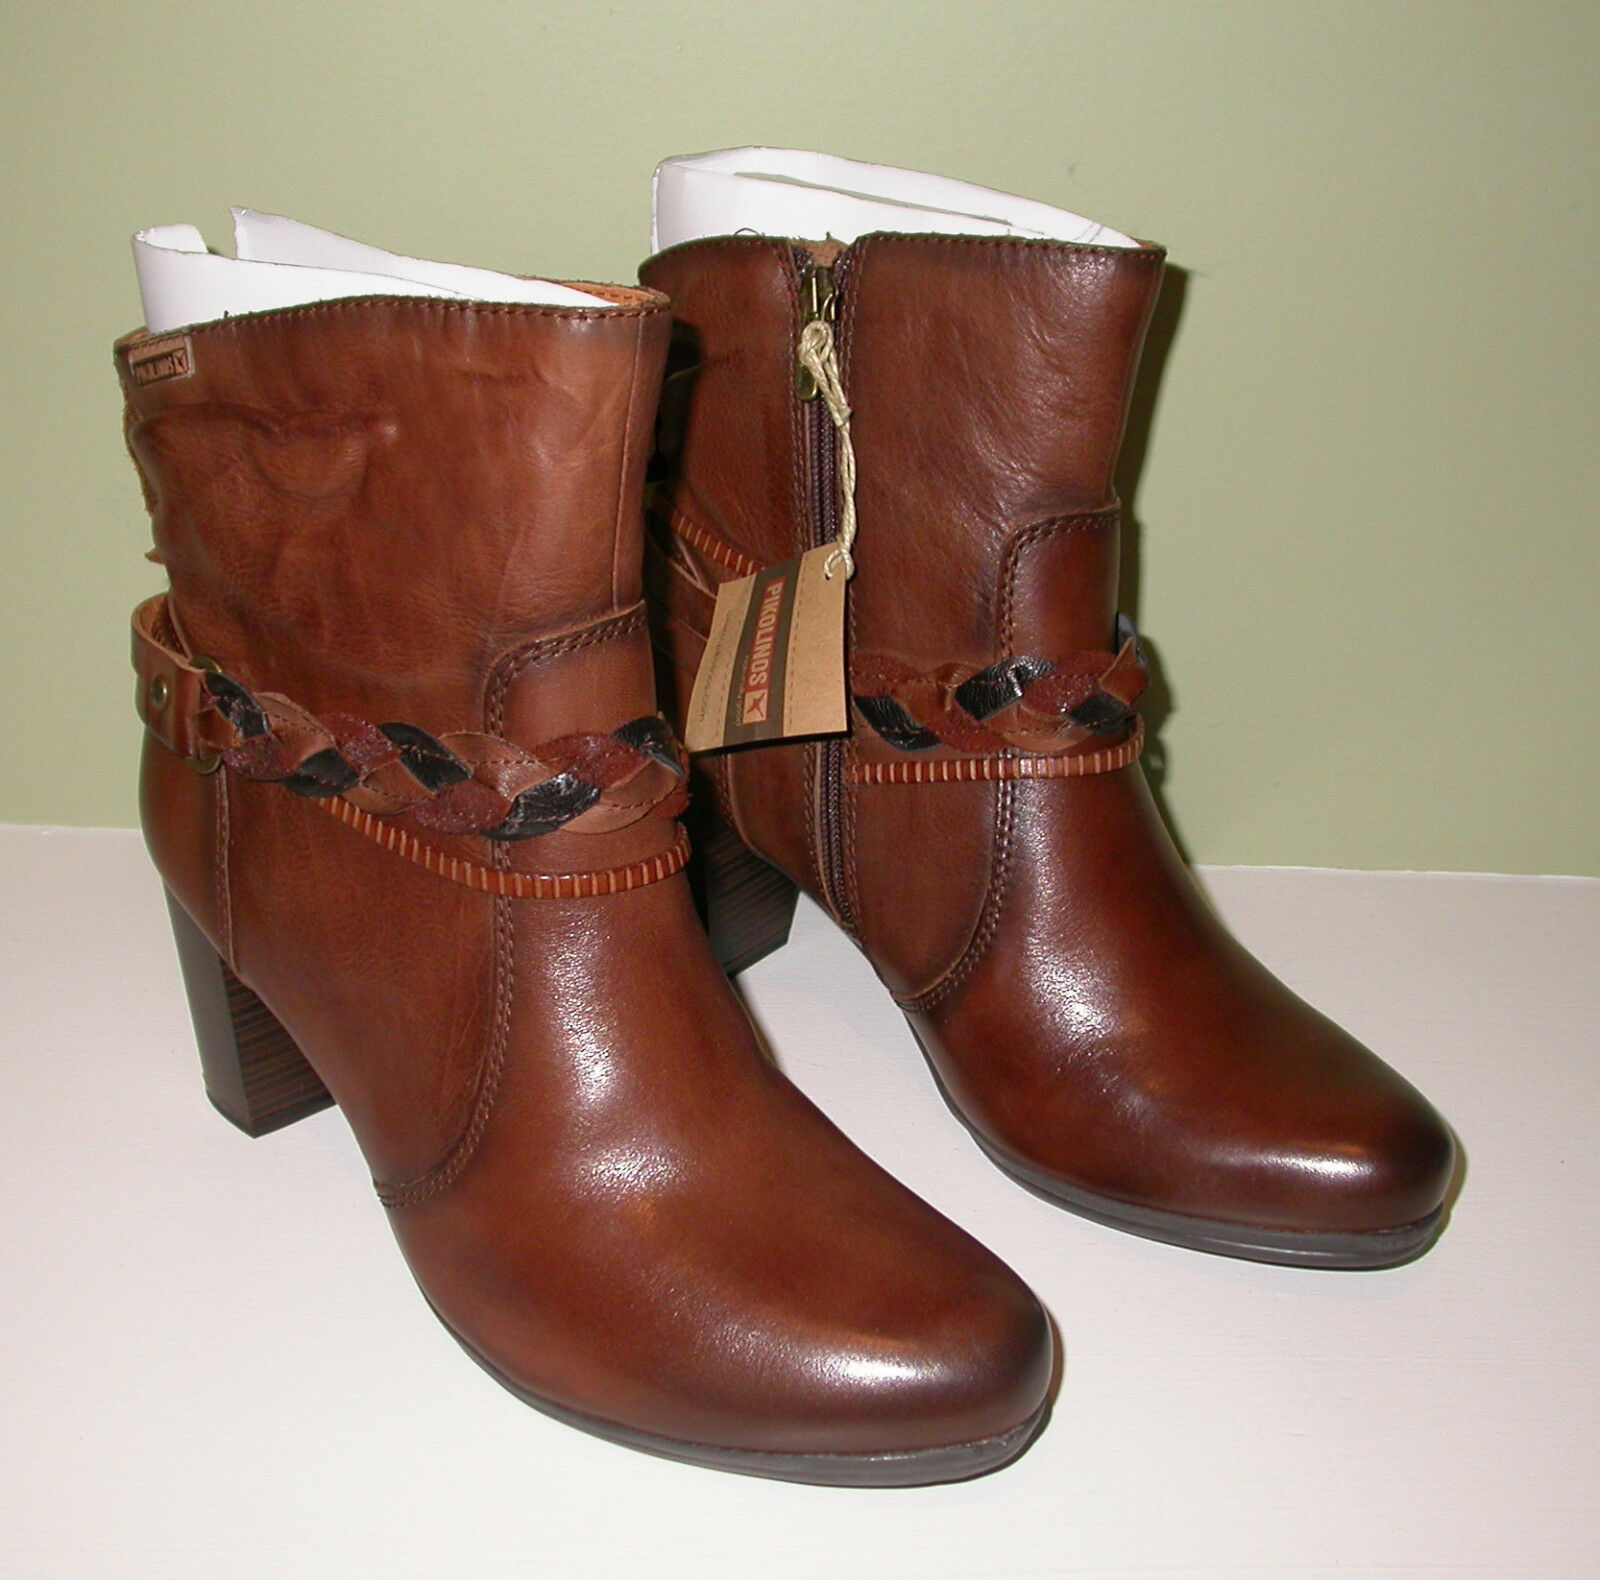 NIB PIKOLINOS Verona W5C-8576 Brown (Cuero) Leather Leather Leather Ankle Boots Sz 39 EU 29efe1